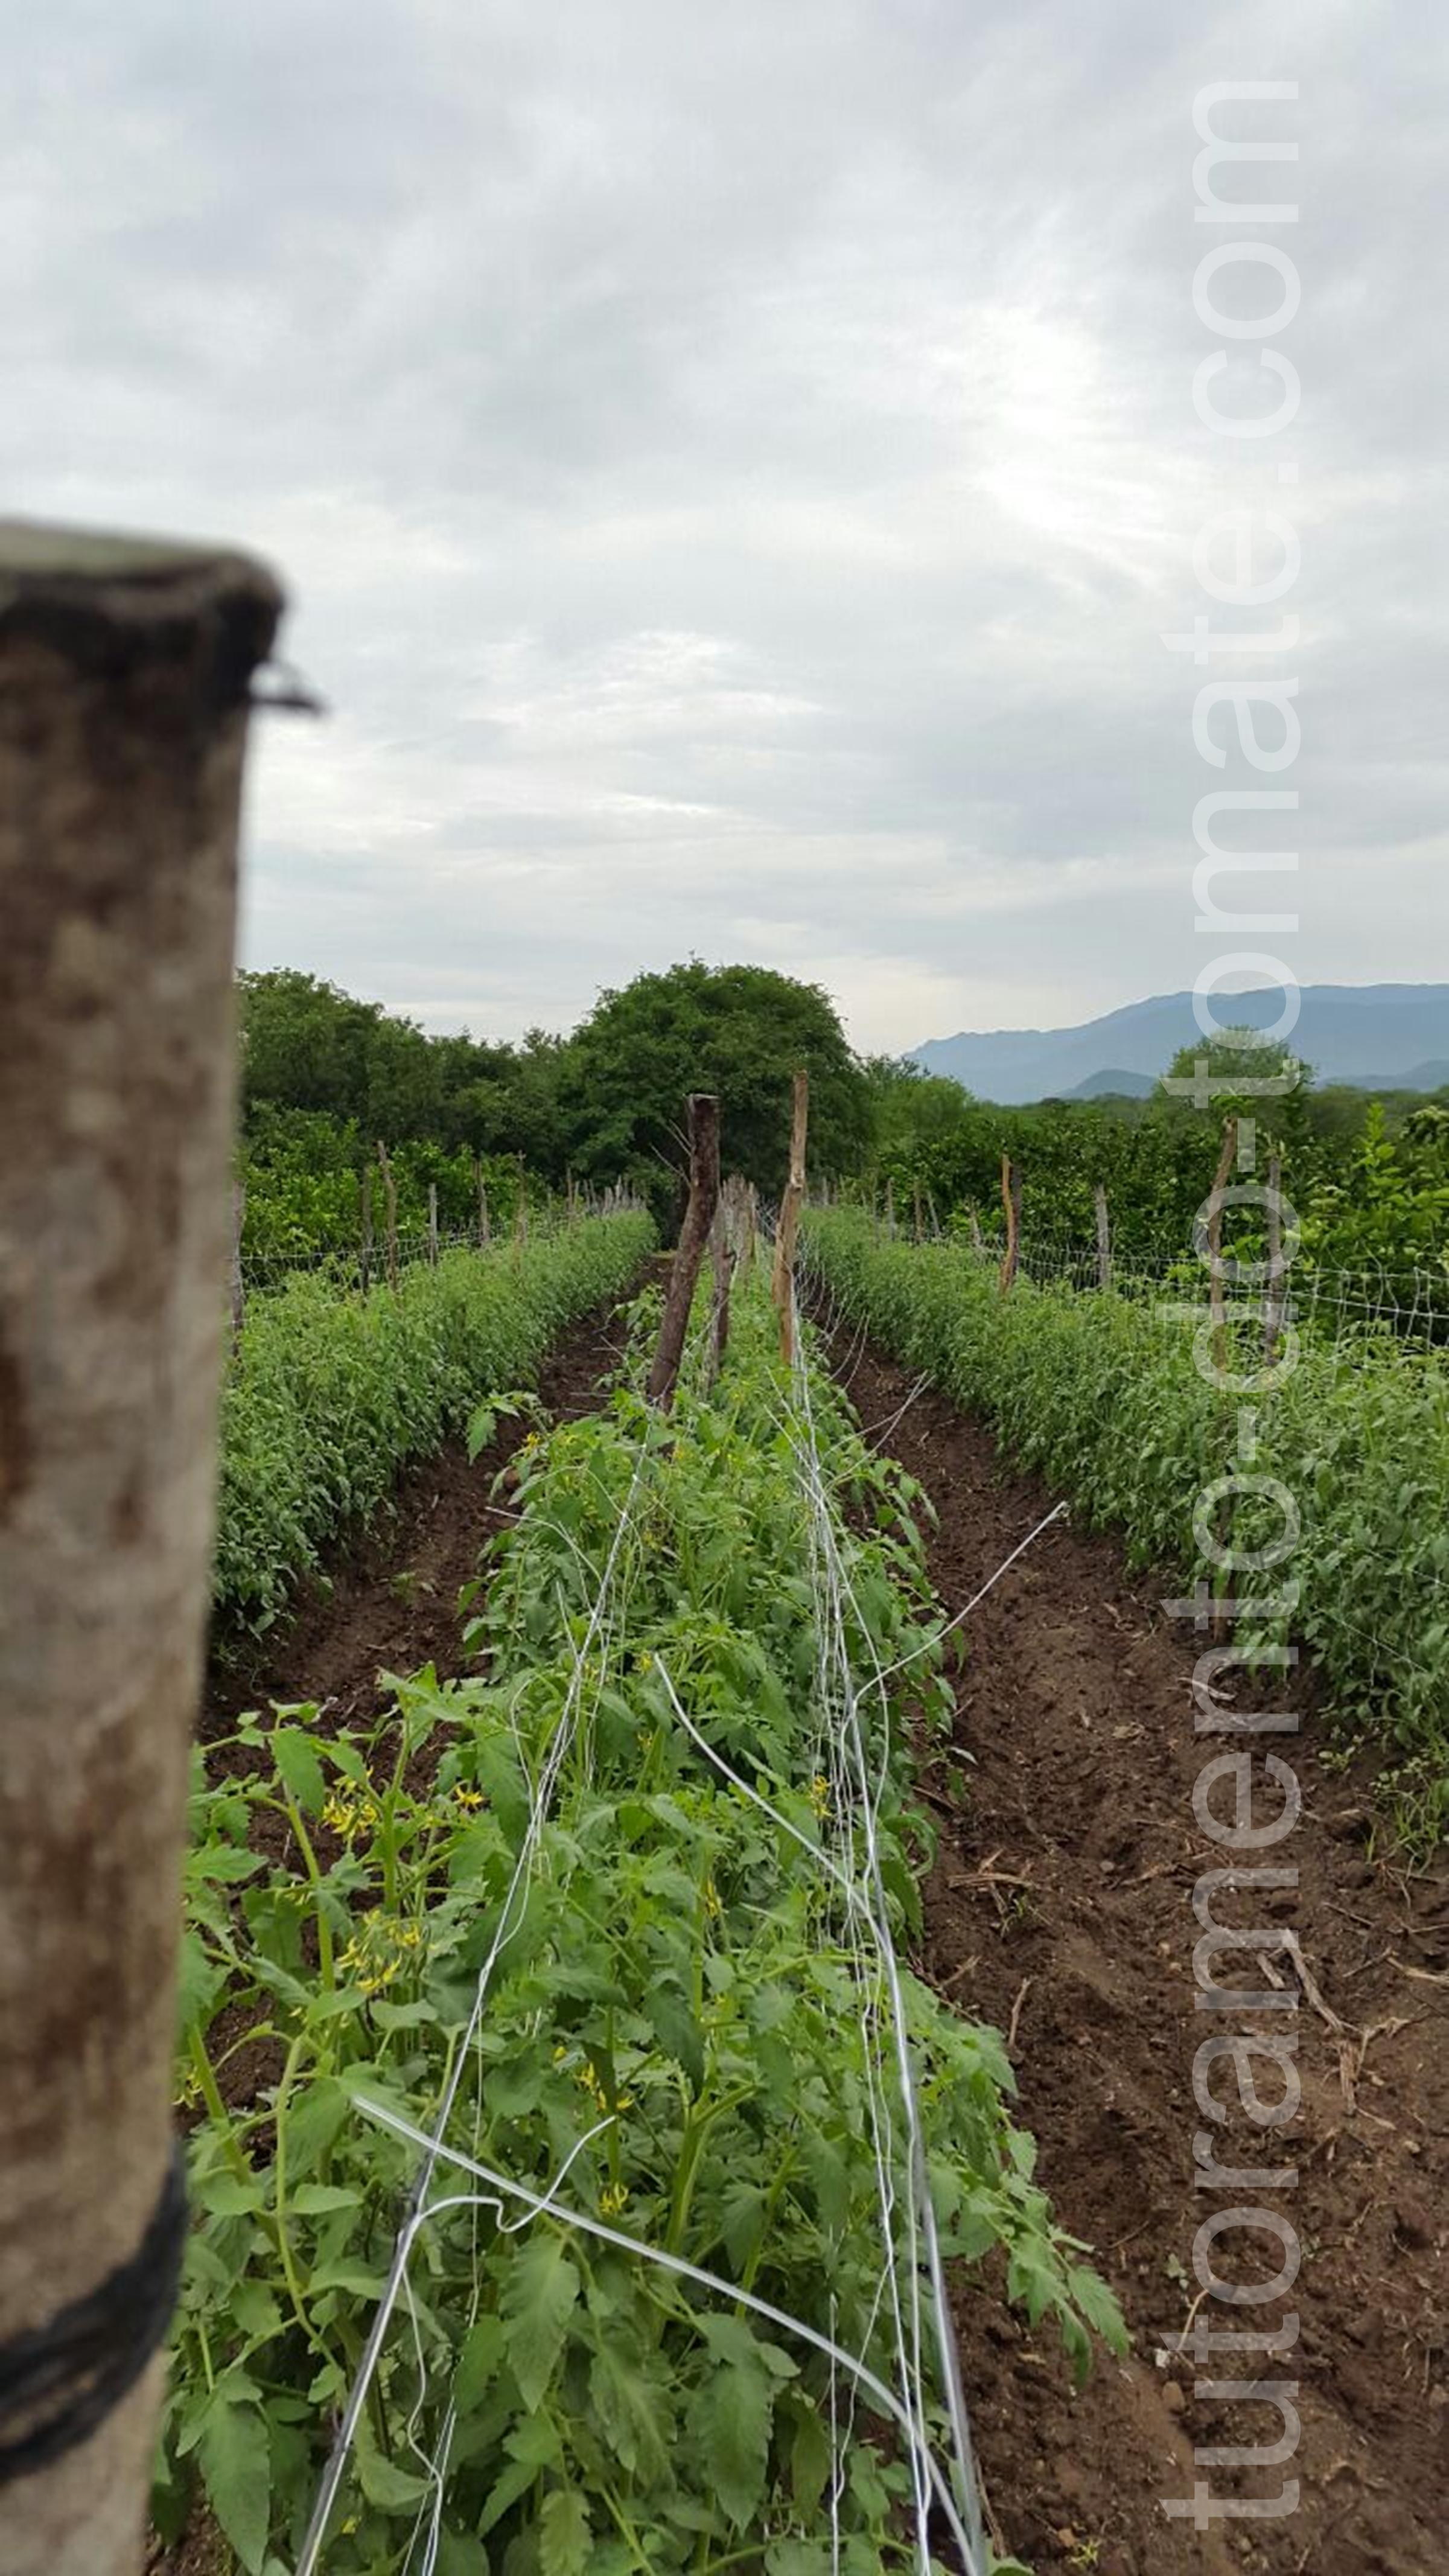 Tutoramento do tomate apoio para hortali as - Tutores para tomates ...